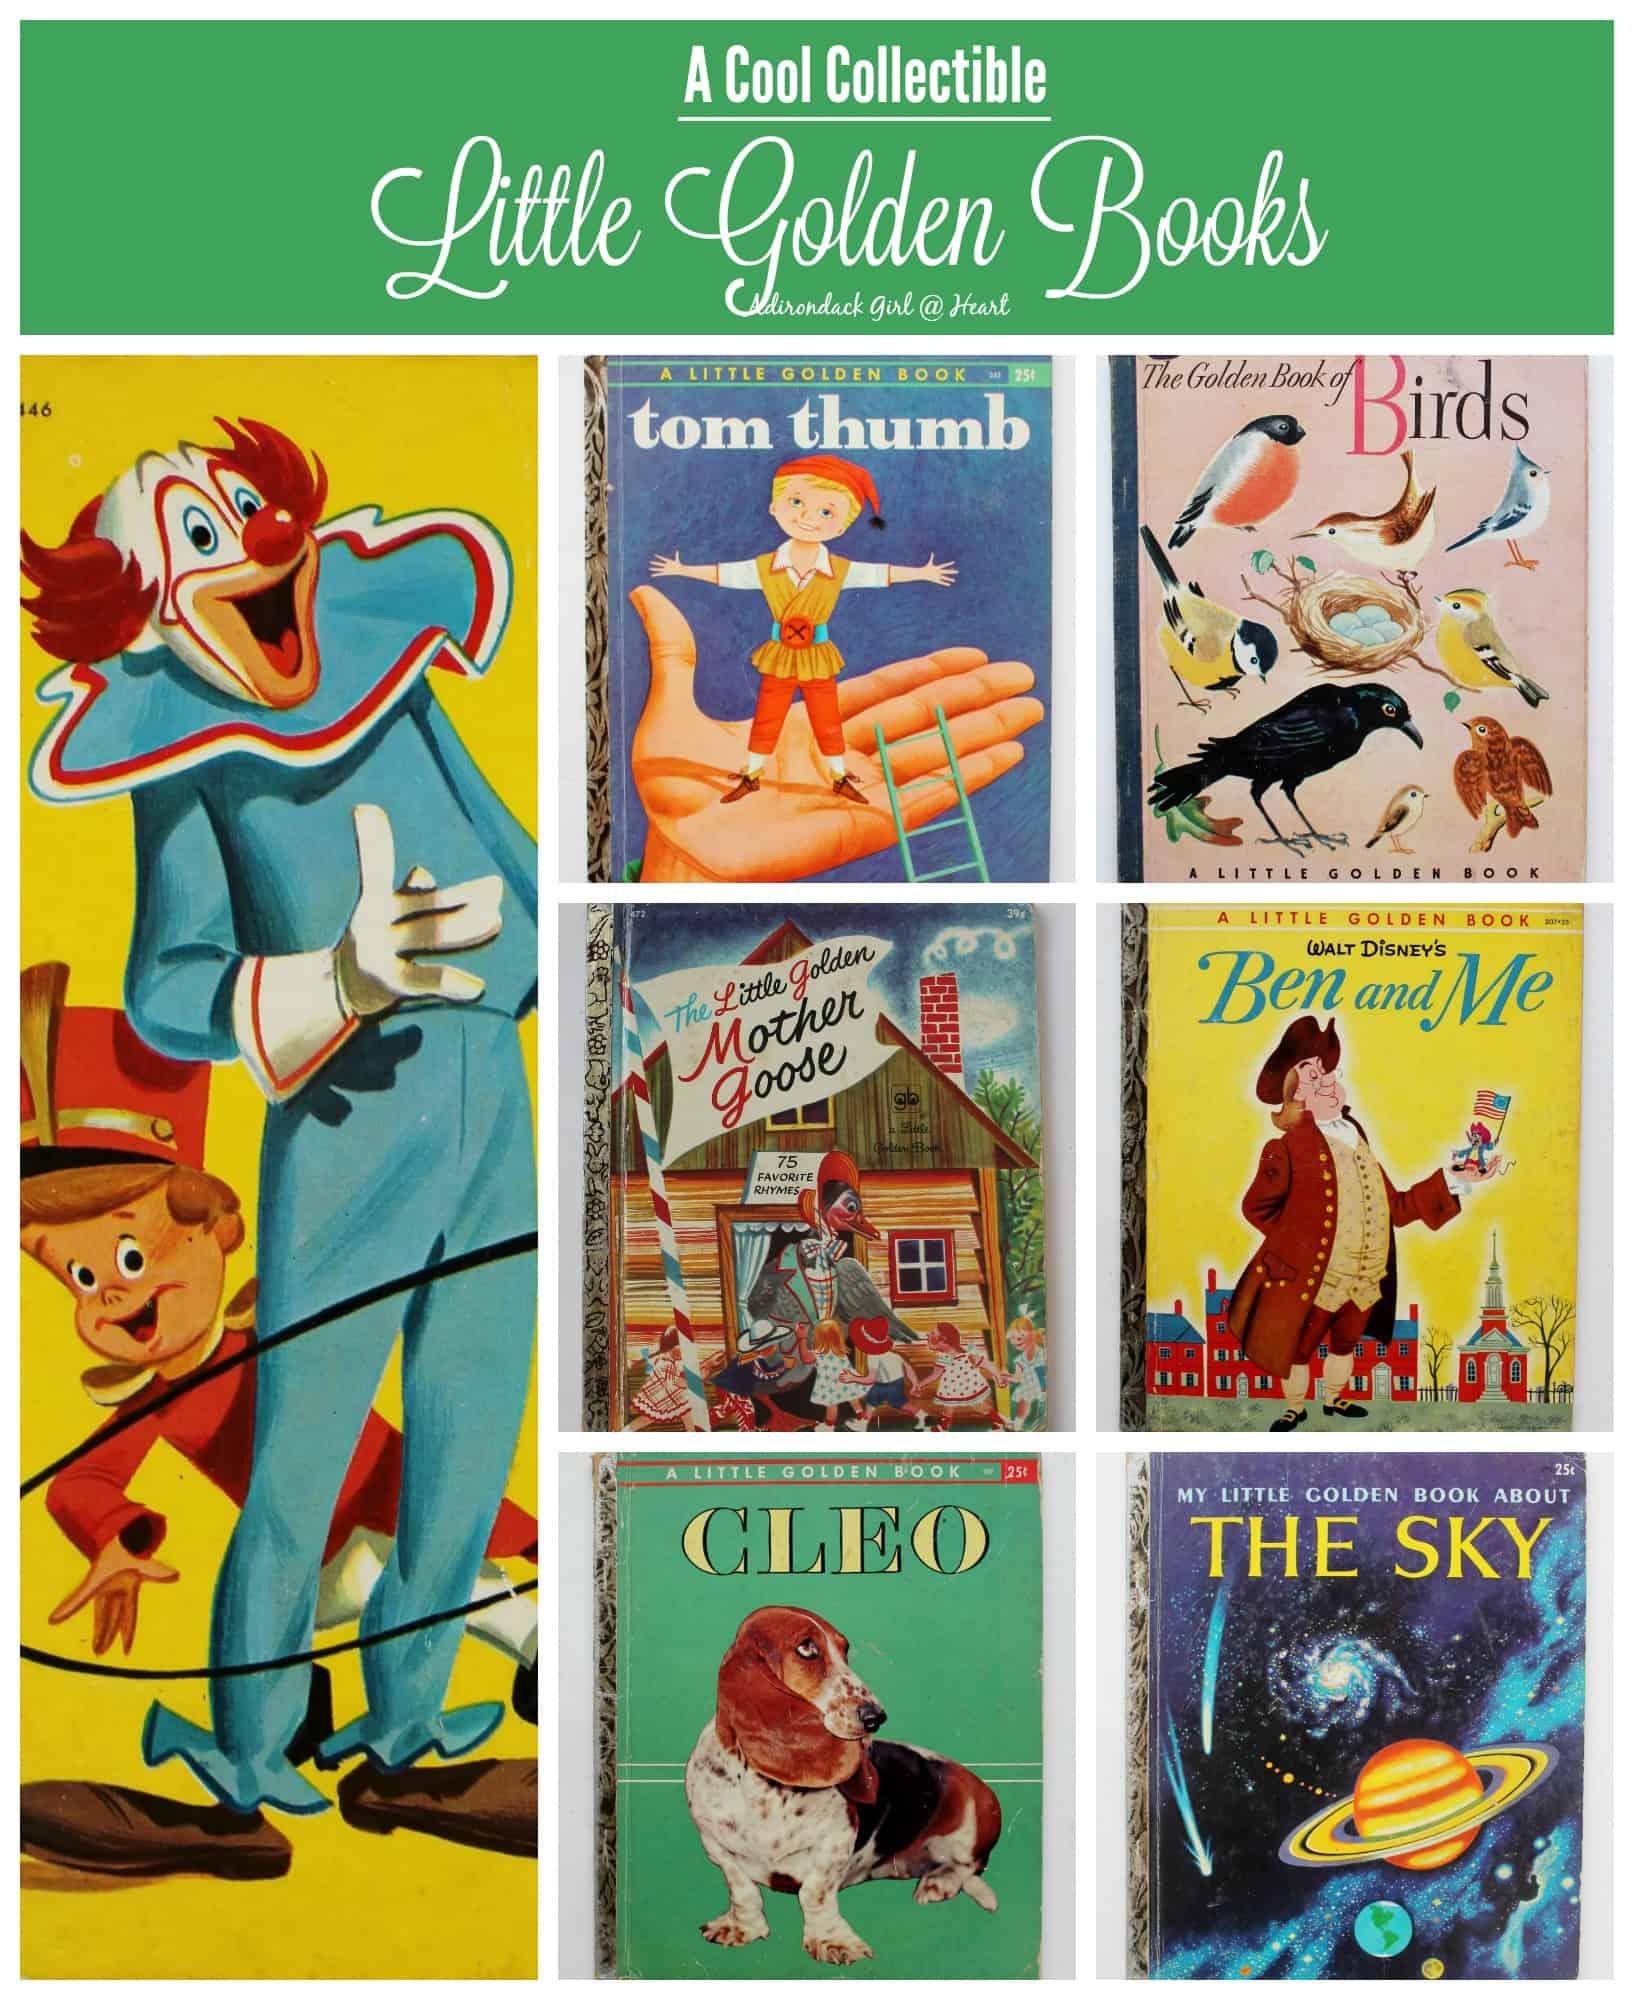 Little Golden Book collage